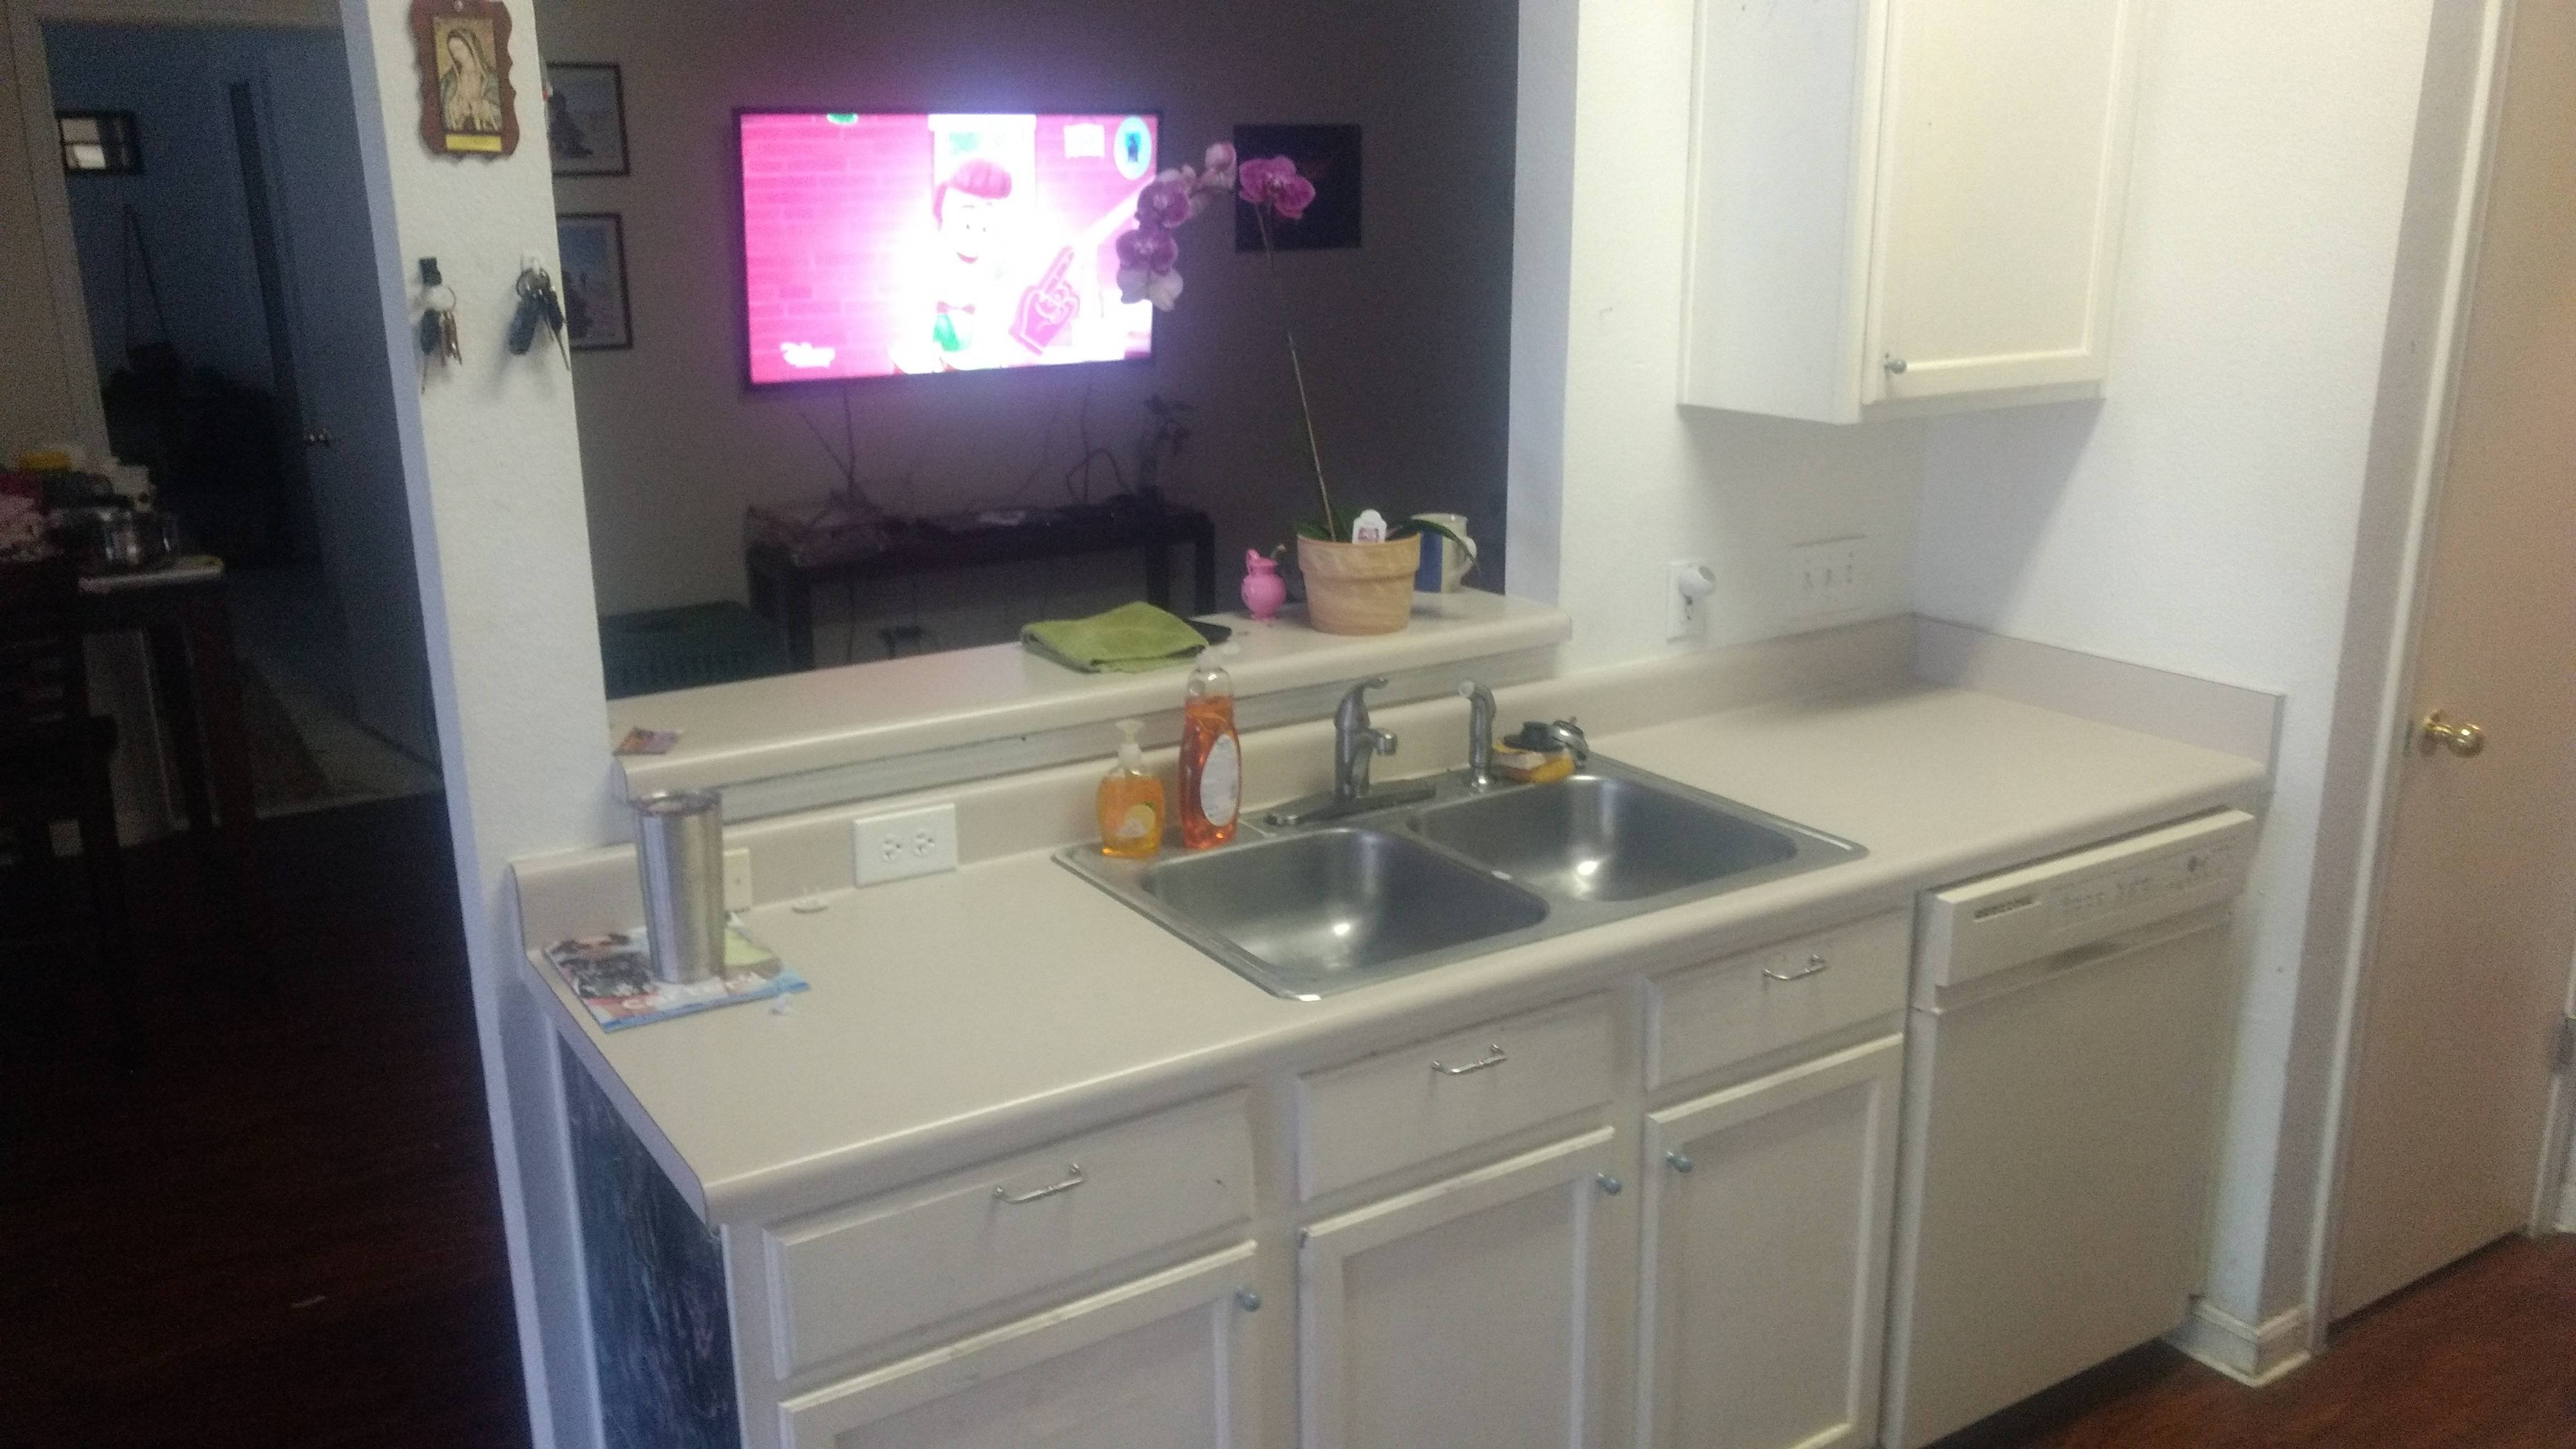 budget kitchen remodel towel bars  5000 excellent at home